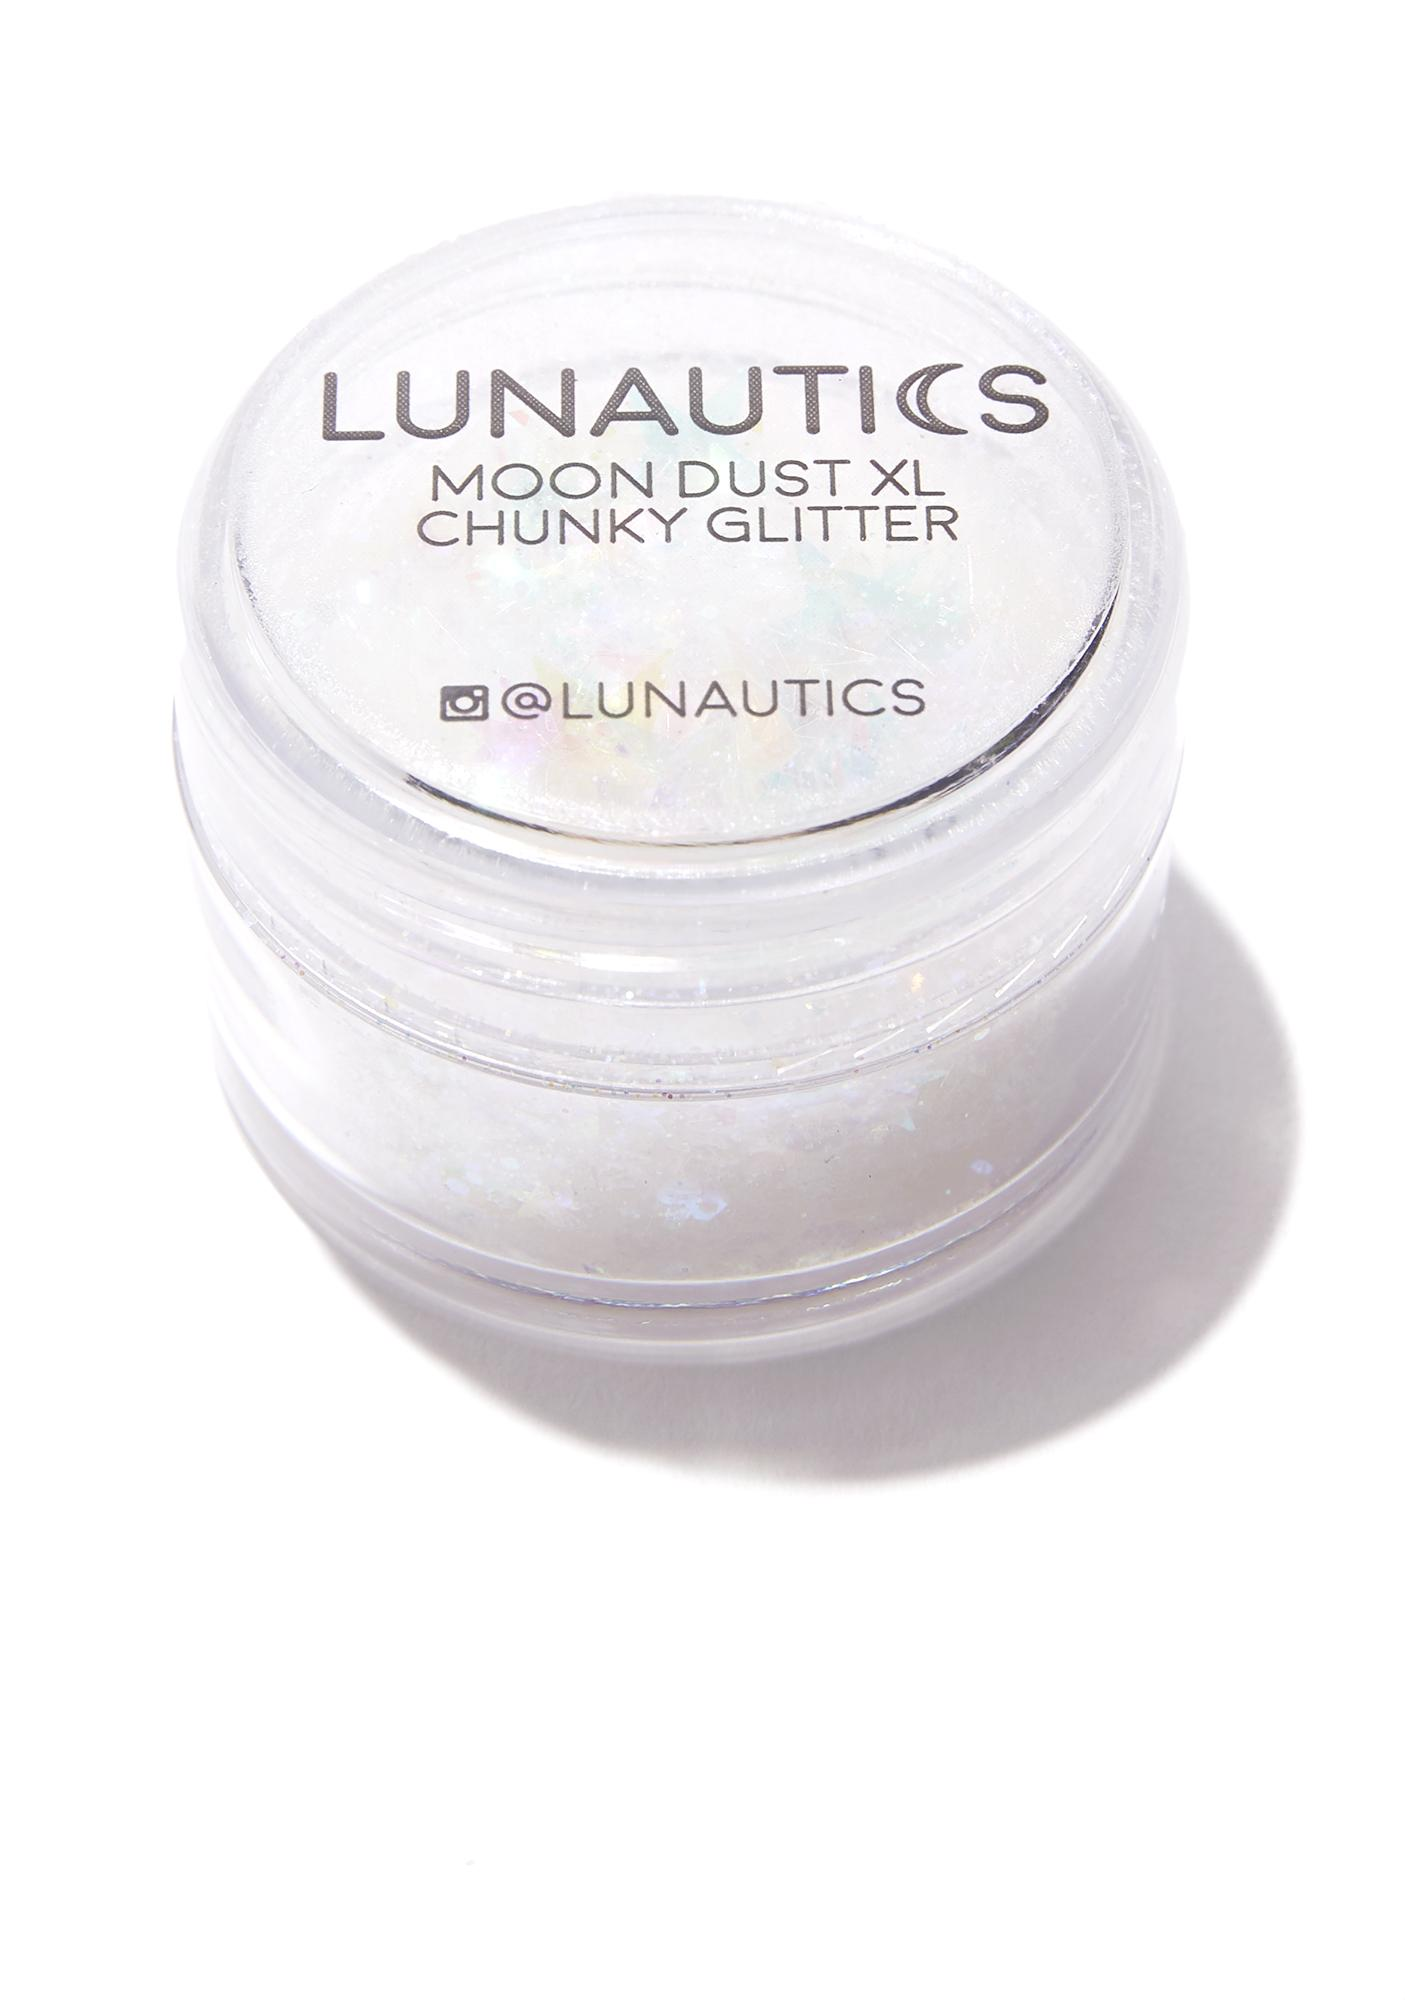 Lunautics Disco Dreams Moon Dust Glitter